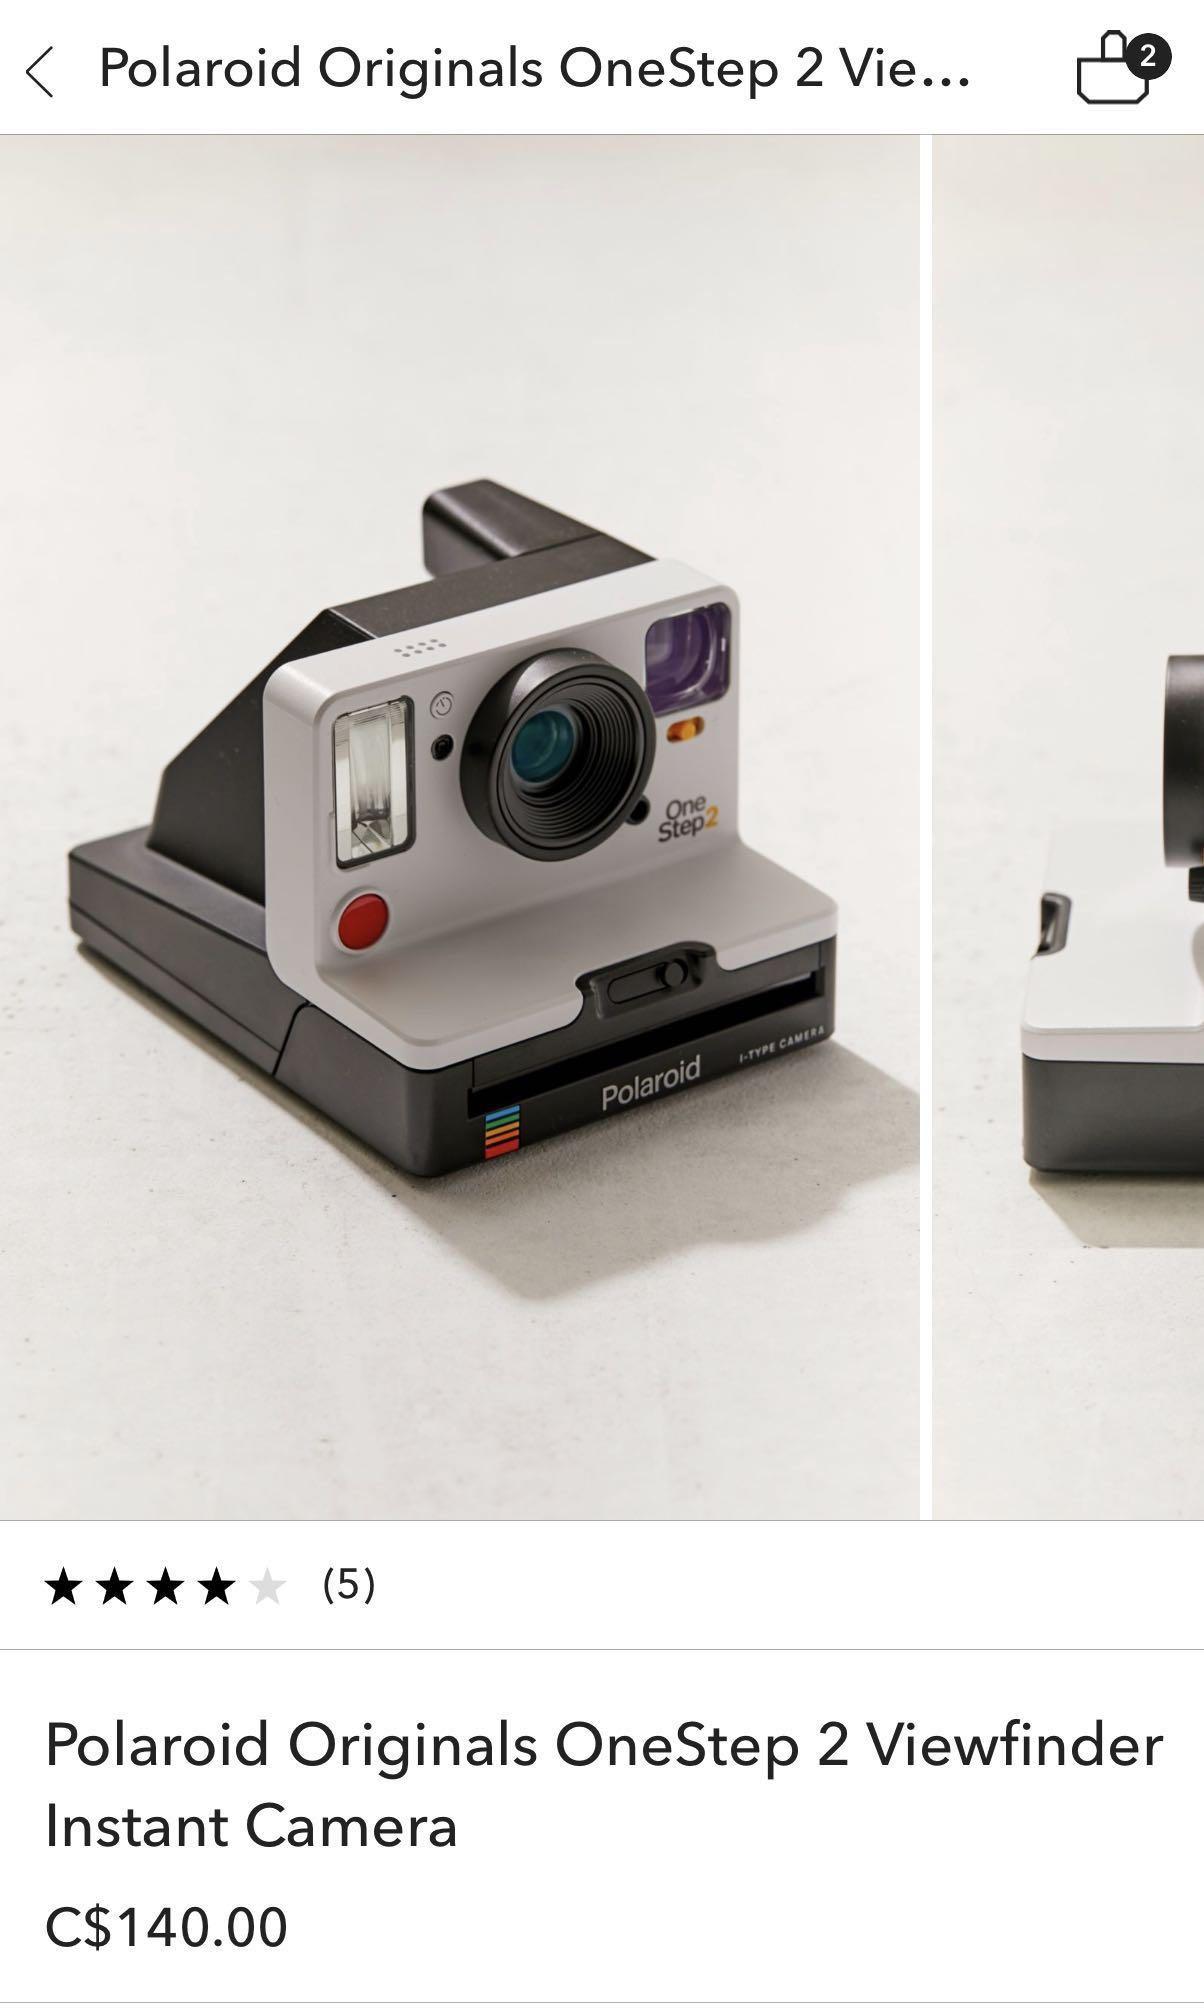 BNIB Polaroid OneStep 2 Camera